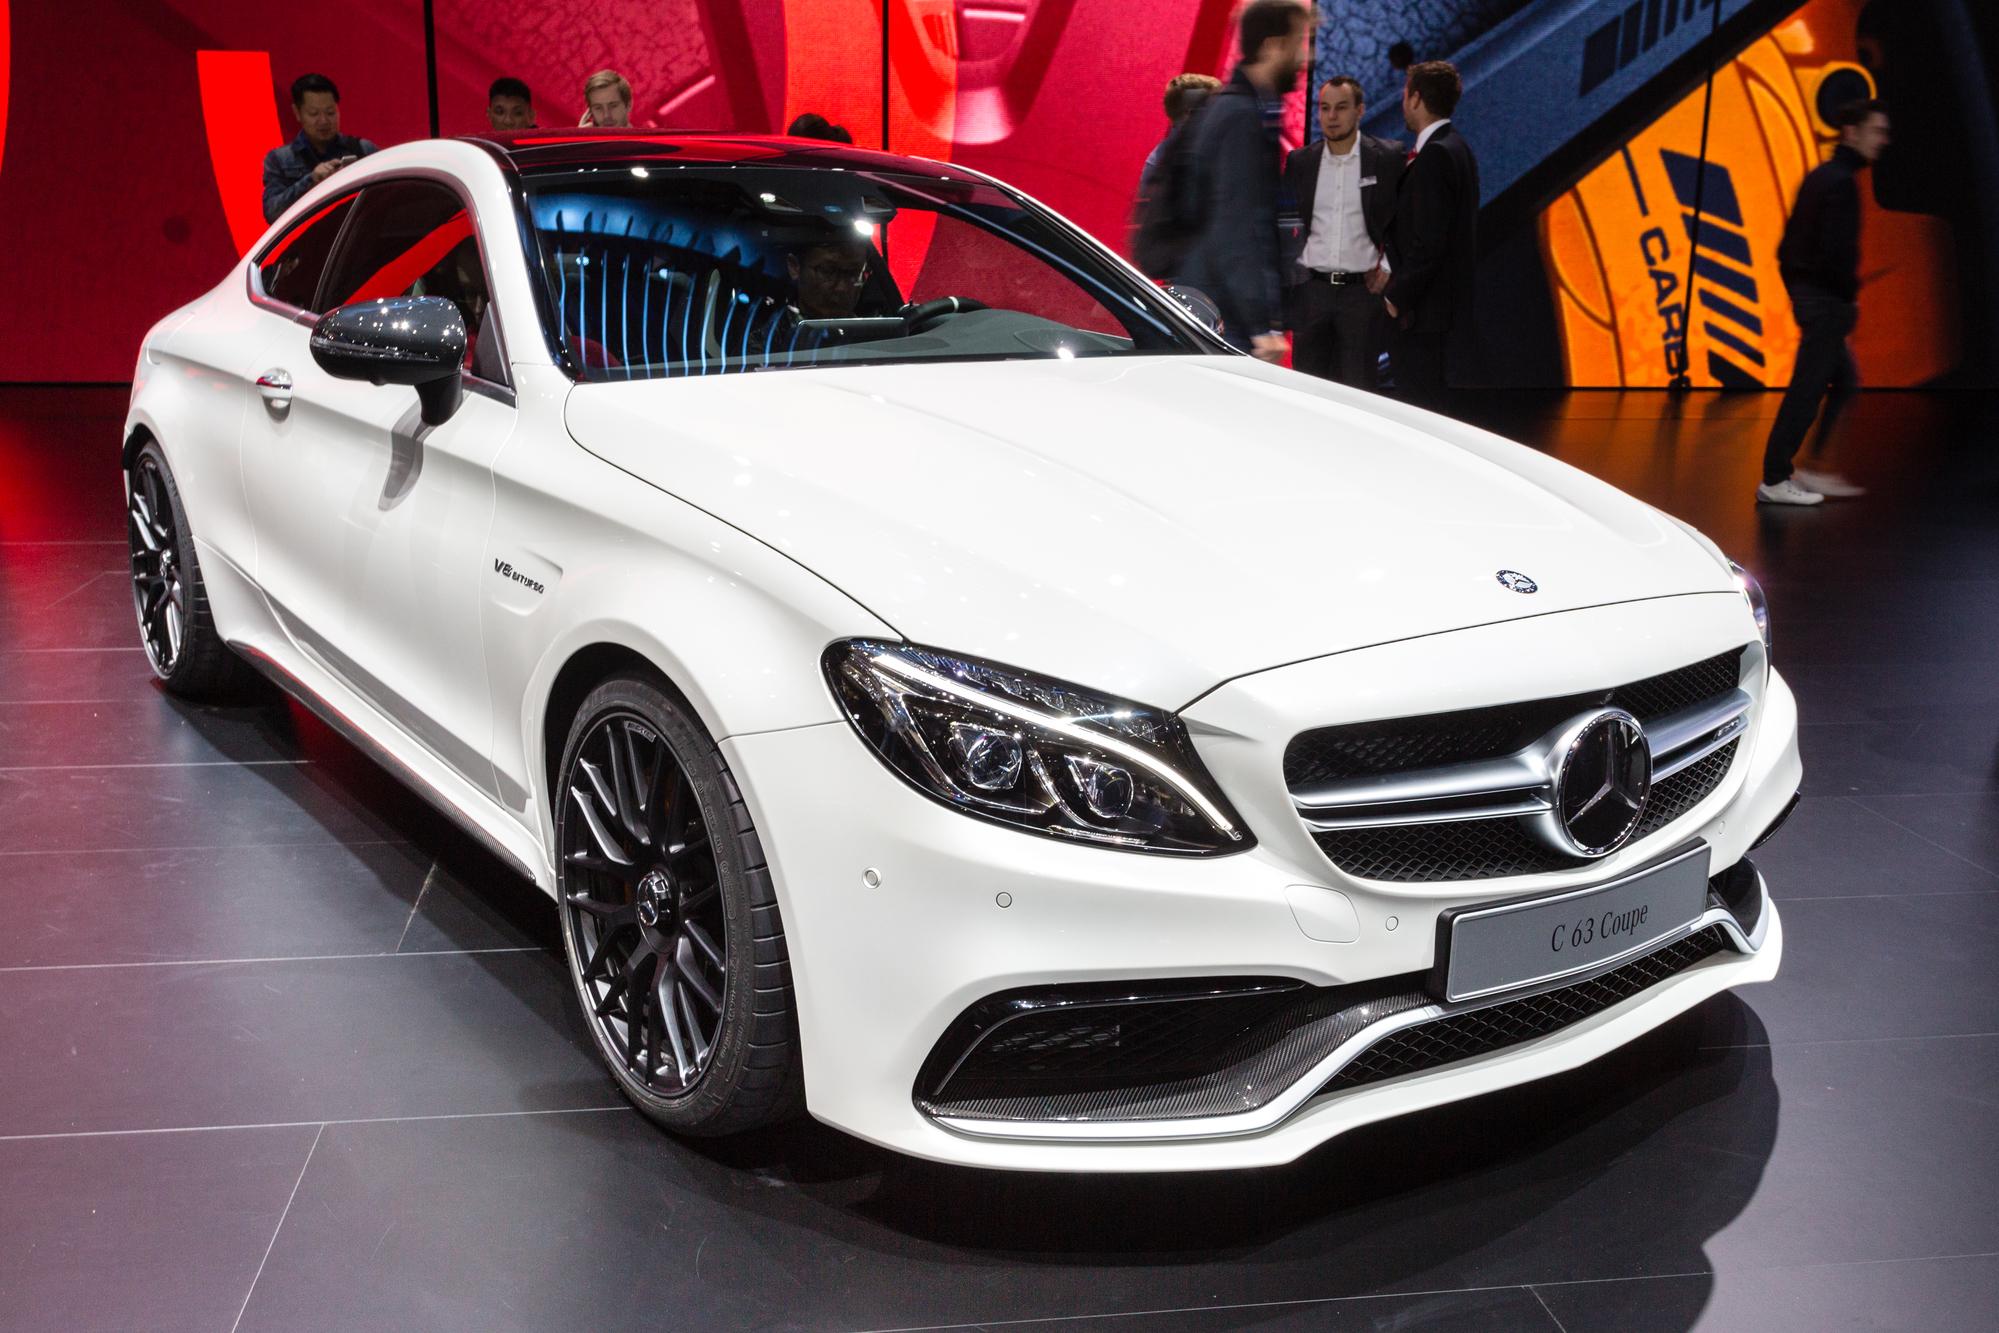 Permalink to Mercedes Benz C63 Amg